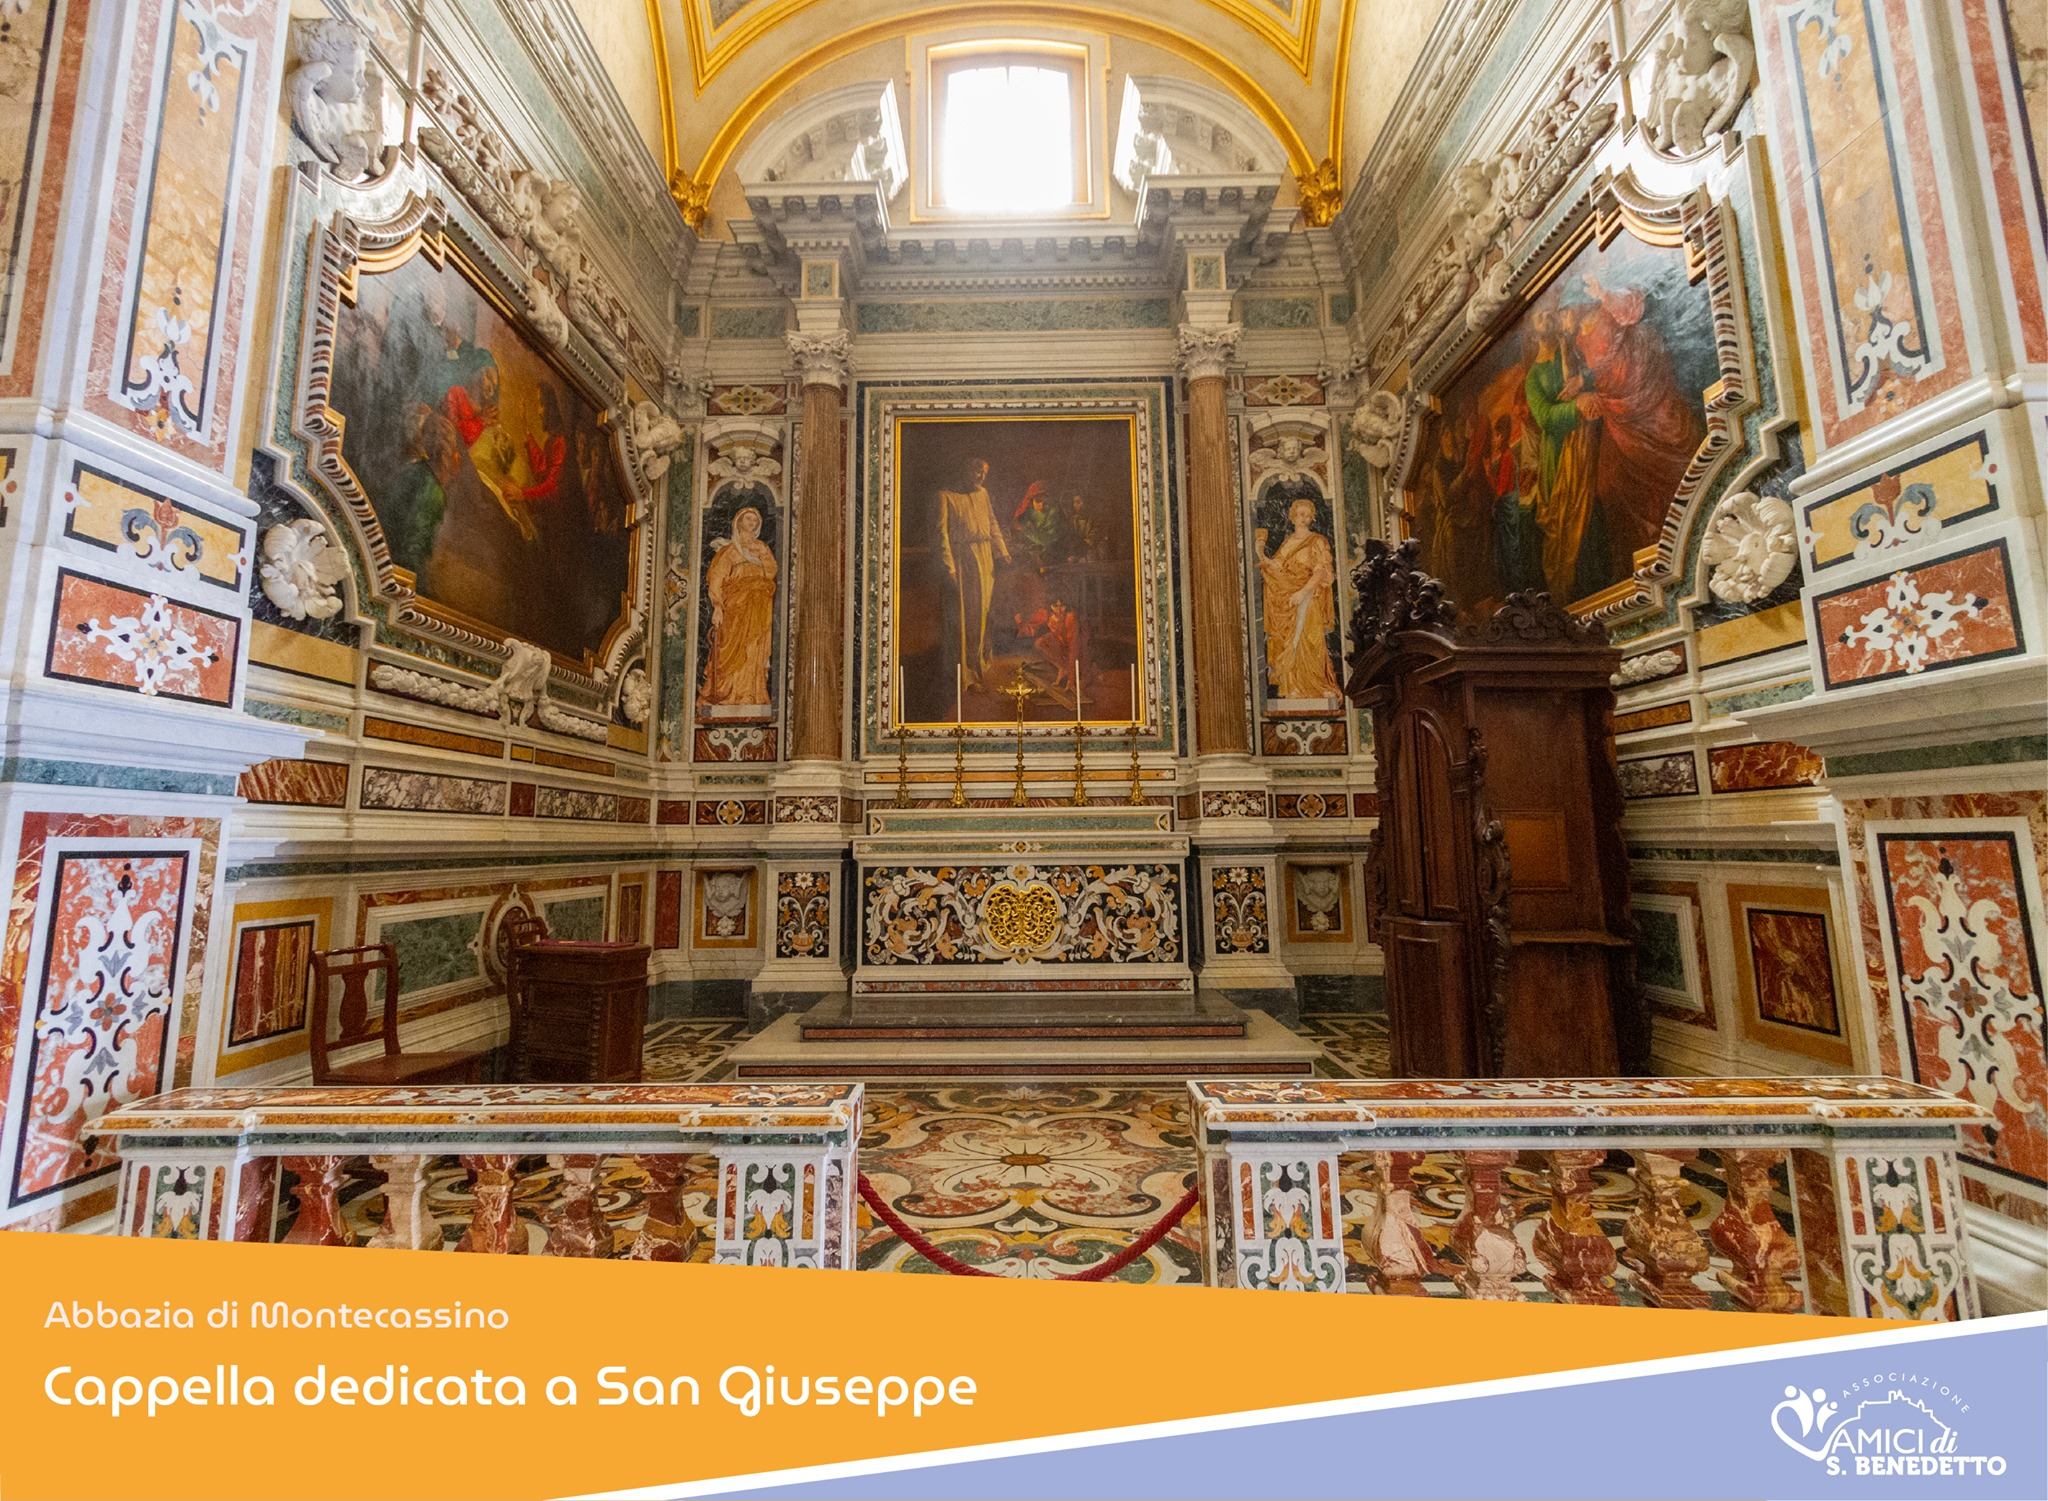 19 MARZO 2021 – La chiesa festeggia San Giuseppe.